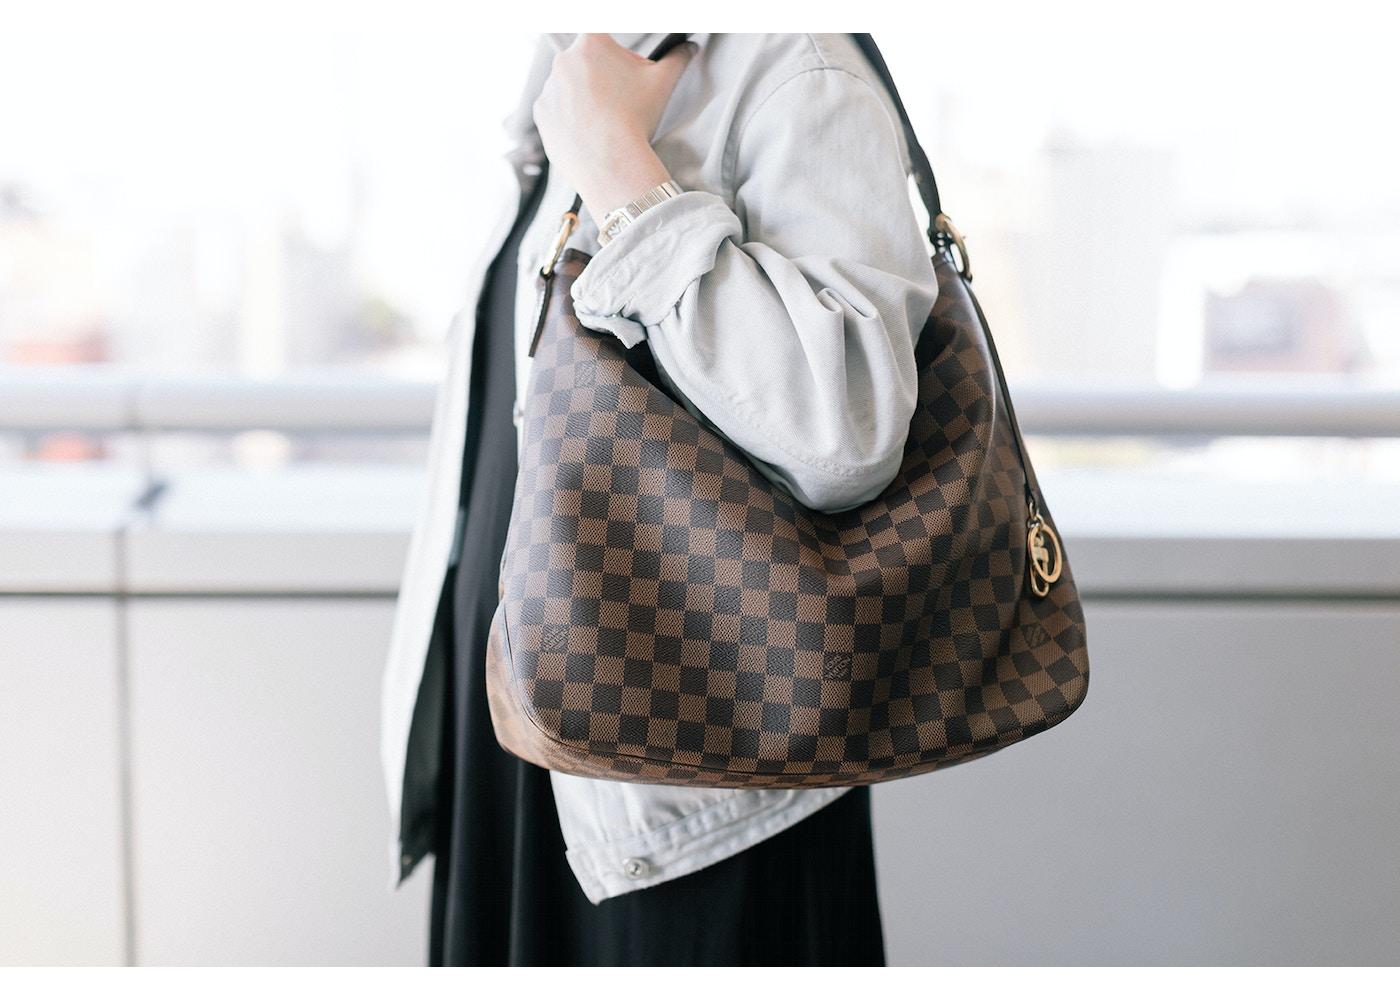 59fc5f24691d5 Louis Vuitton Delightful Nm Damier Ebene MM Brown